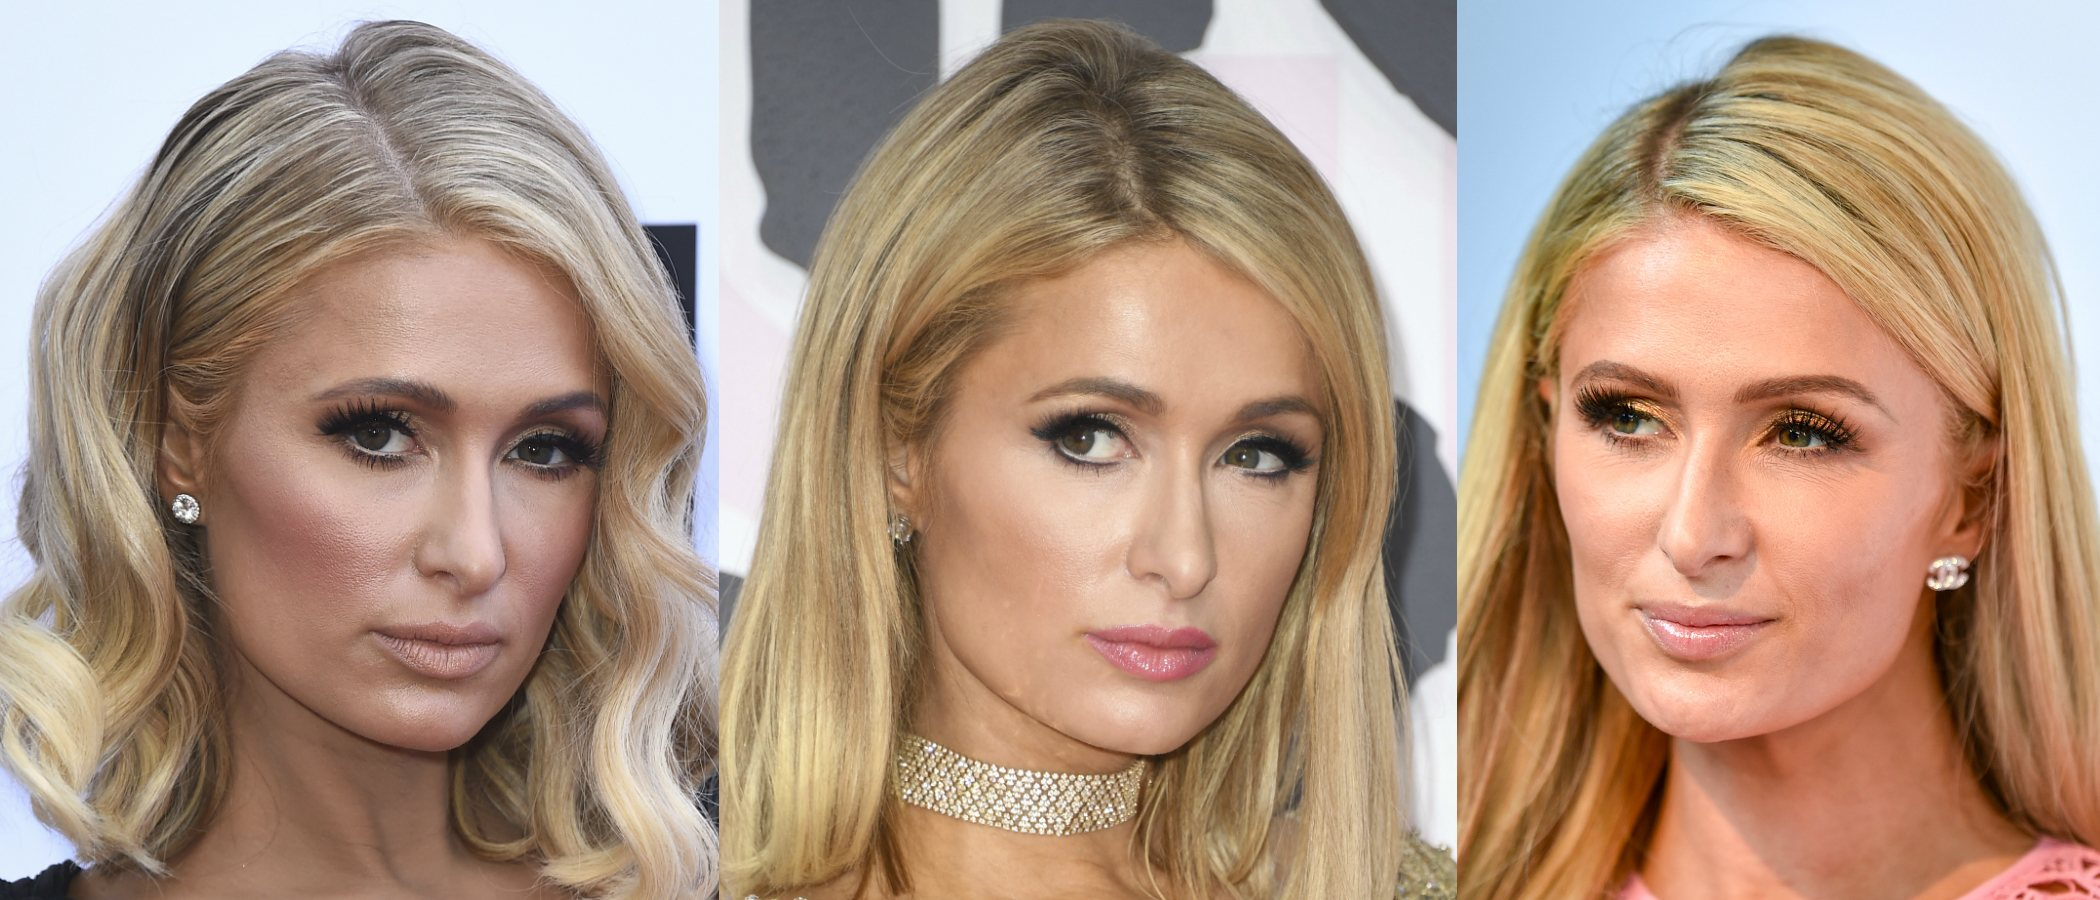 Maquíllate como Paris Hilton